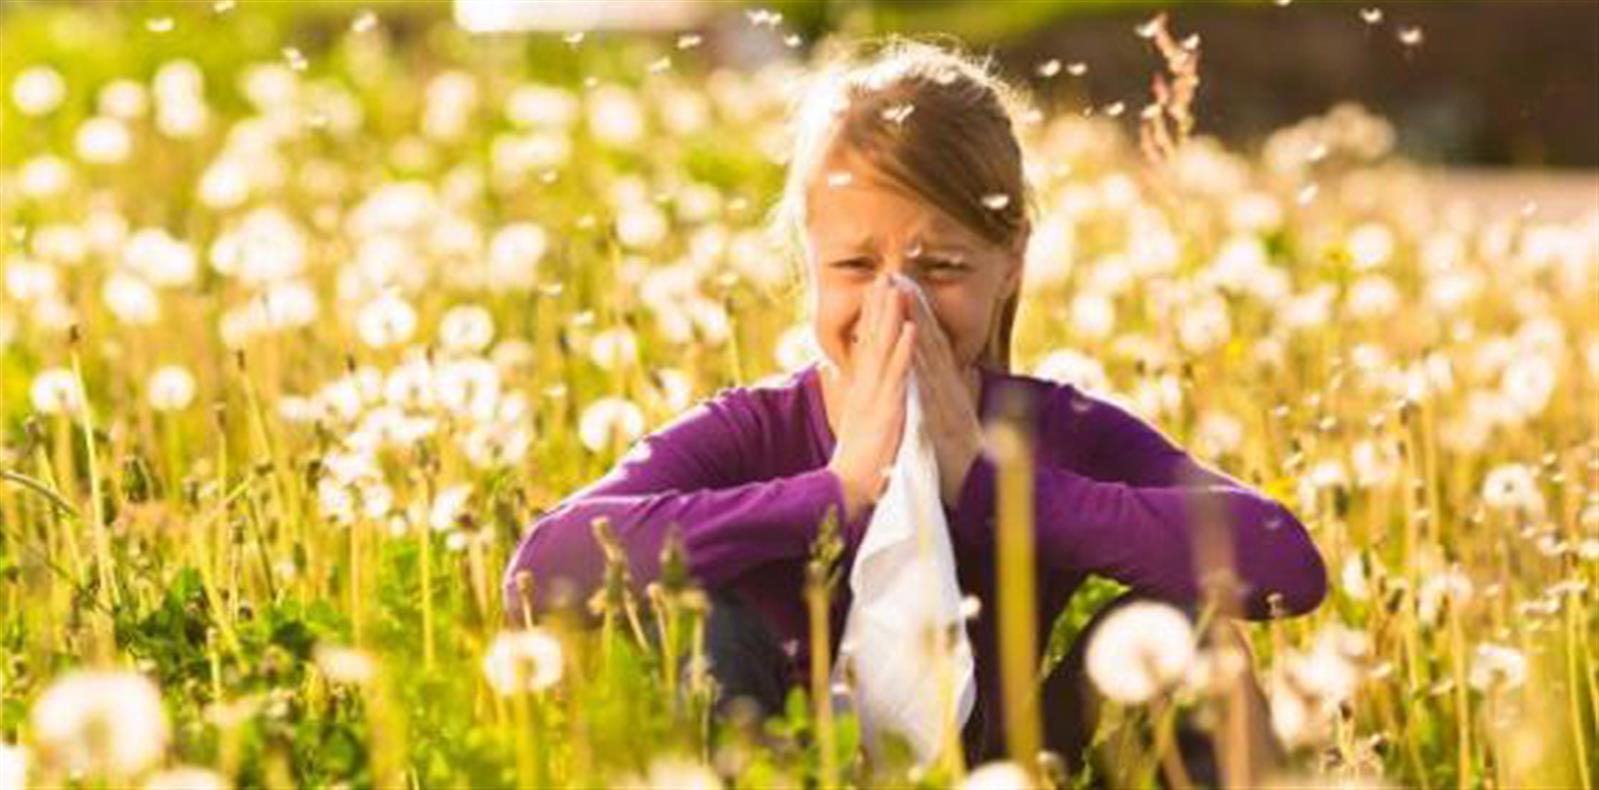 BLog alleergia pollini